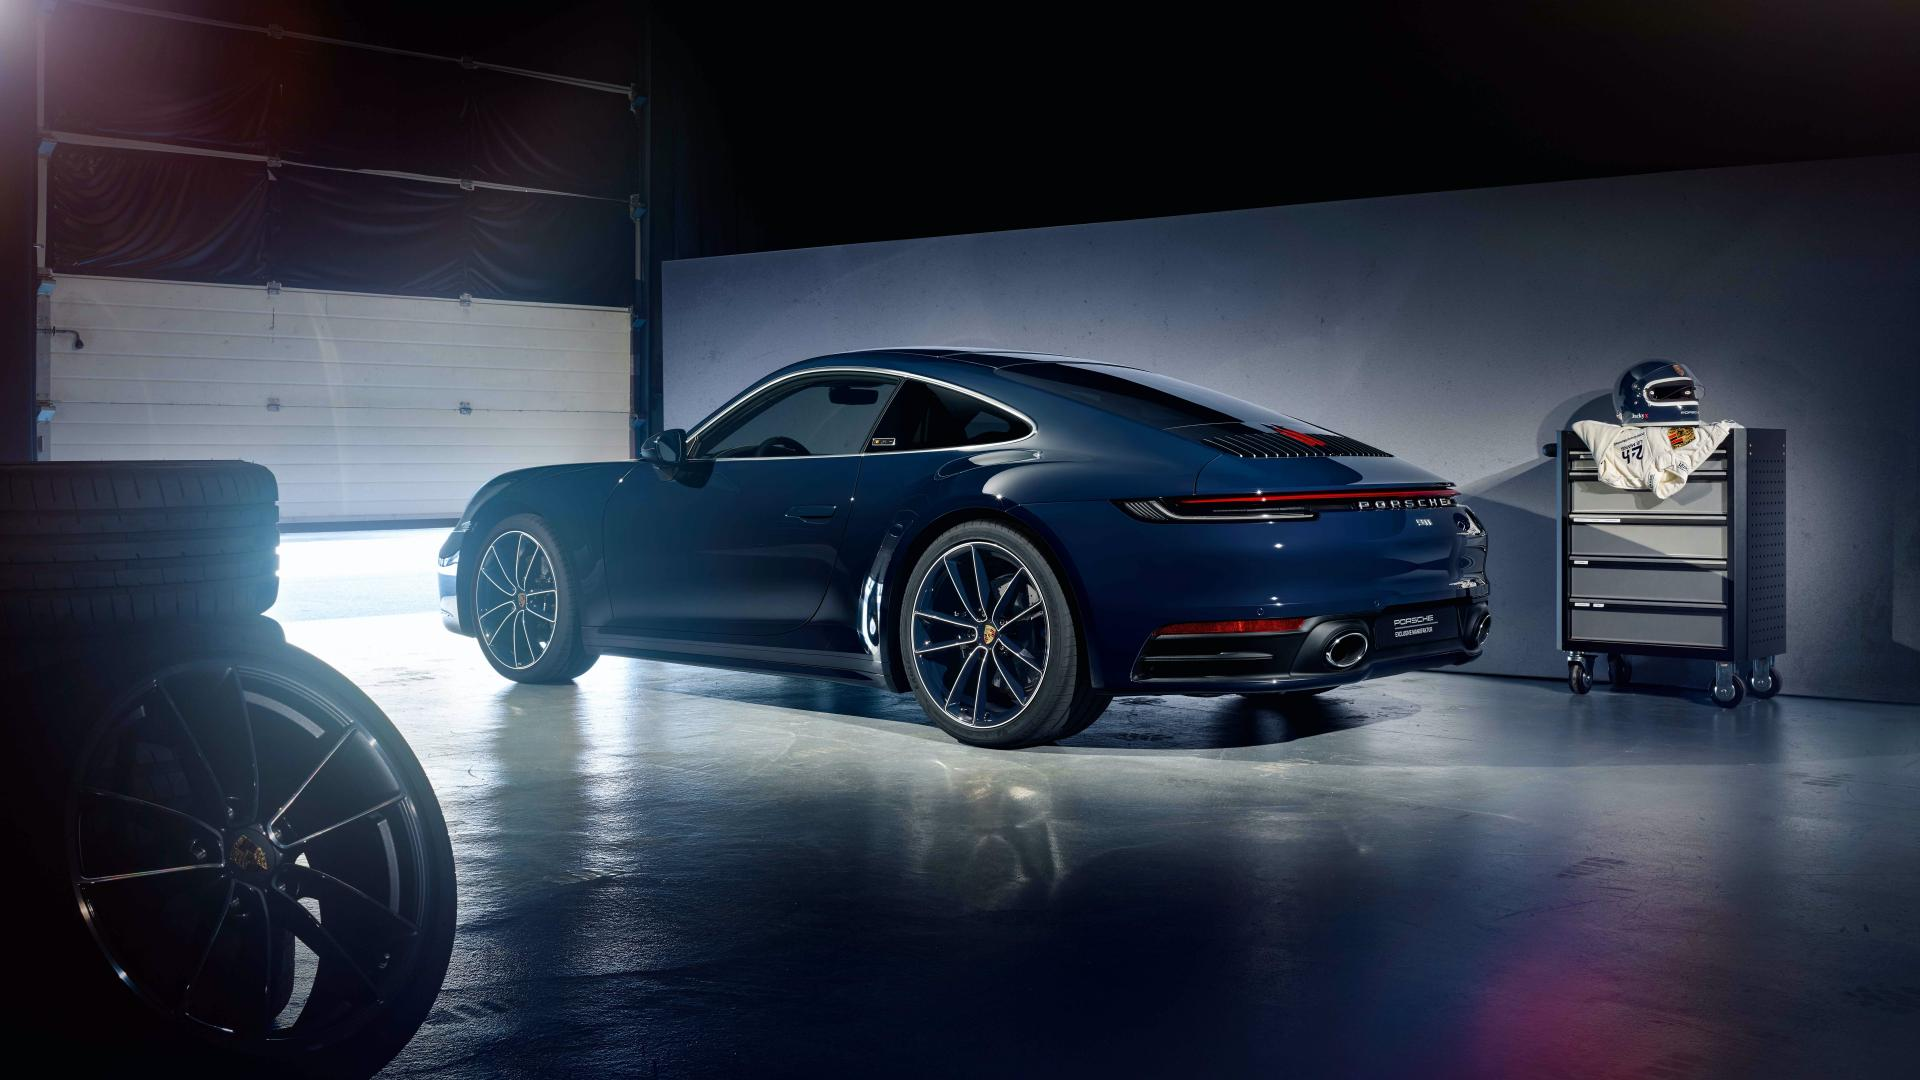 Porsche-911-Belgian-Legend-Edition-2020-Jacky-Ickx-11